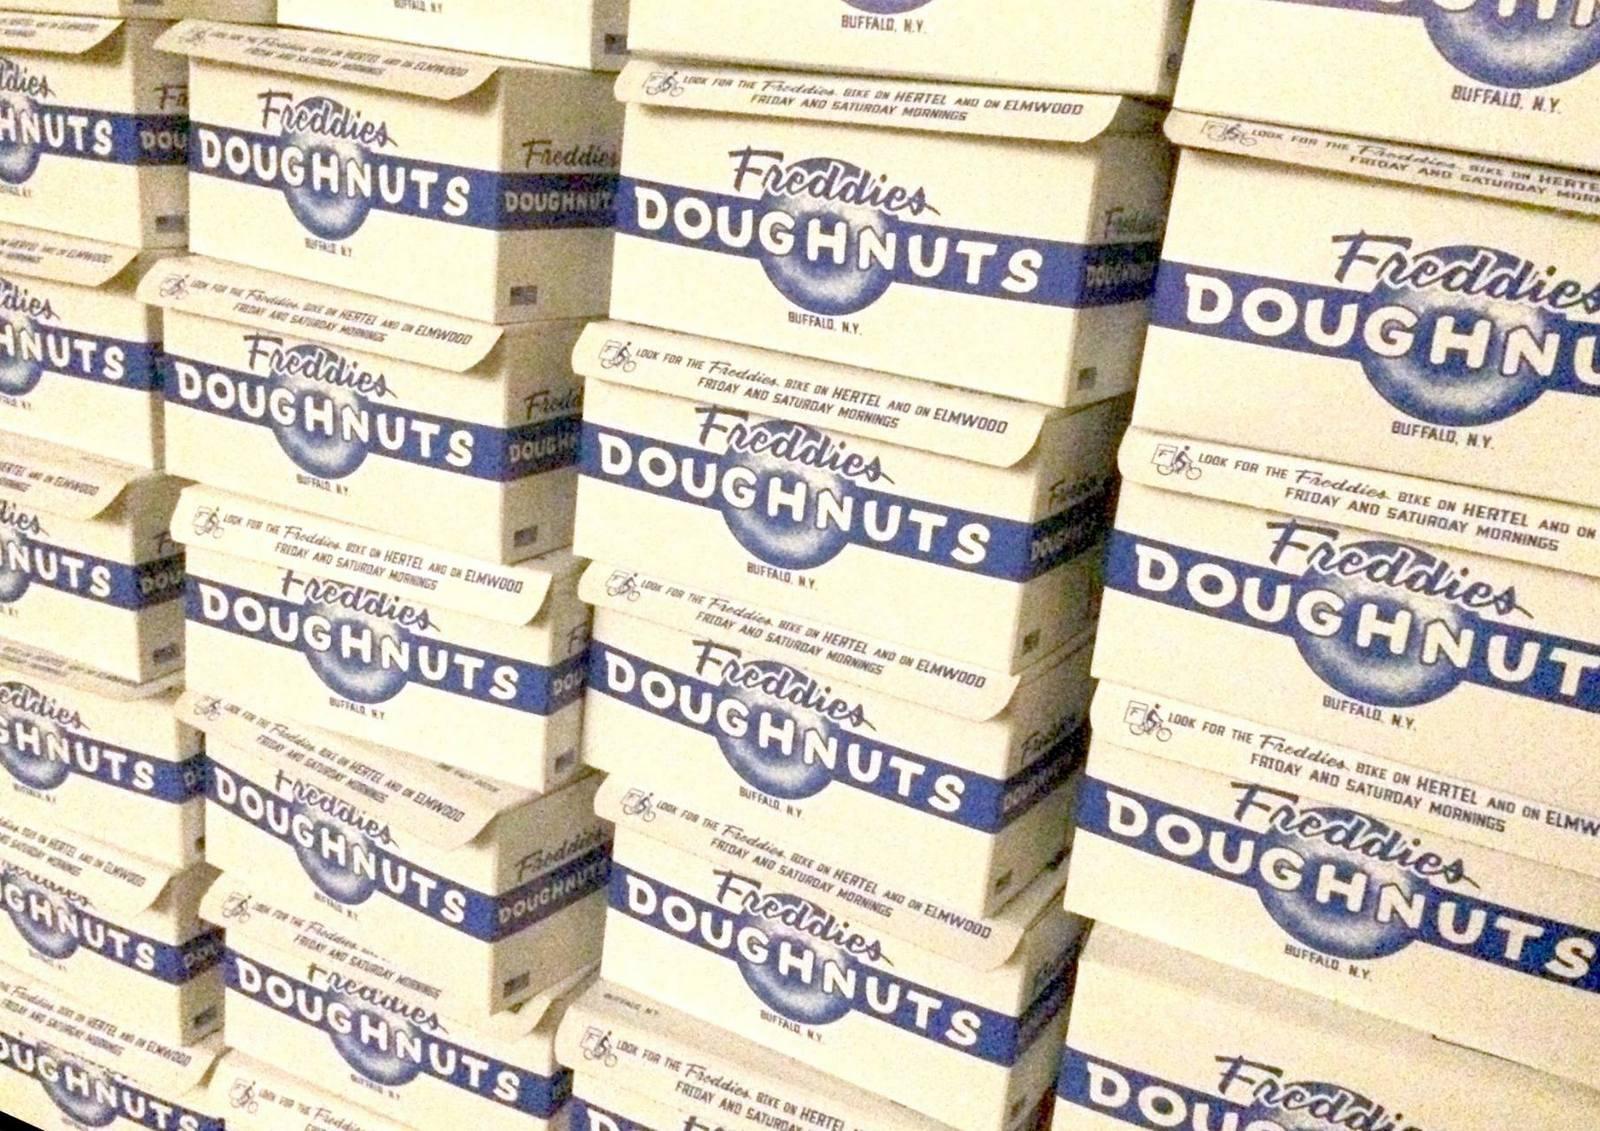 Fred Frandina is bringing back Freddies Doughnuts, a half-dozen at a time. (Freddies Doughnuts)